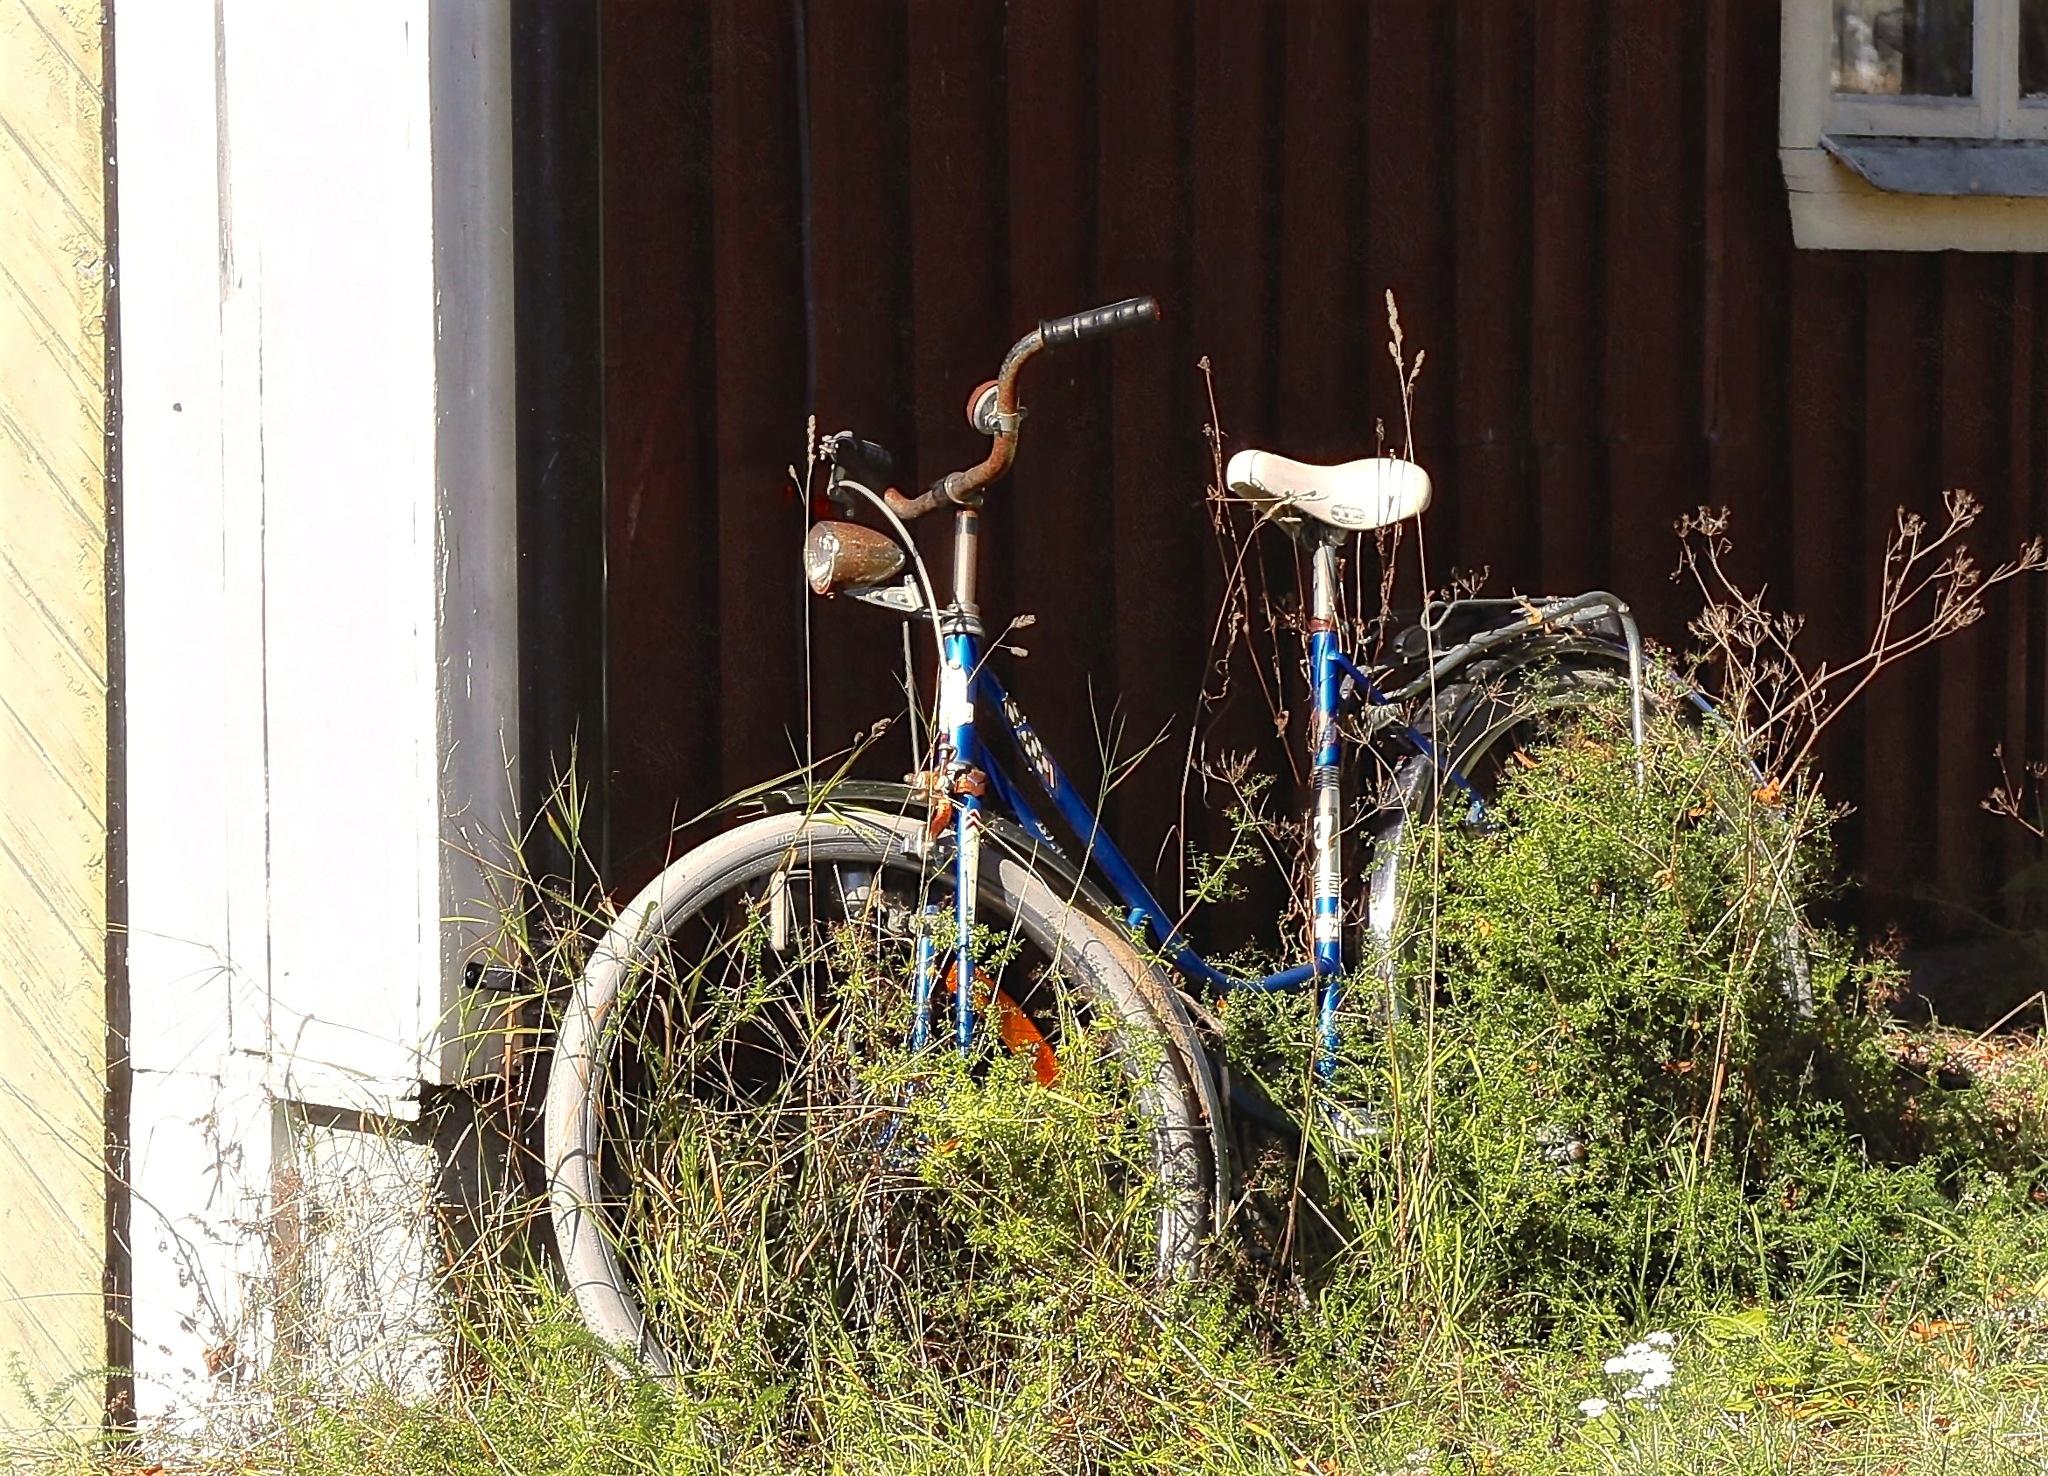 eco-friendly by Jarl Gillenberg